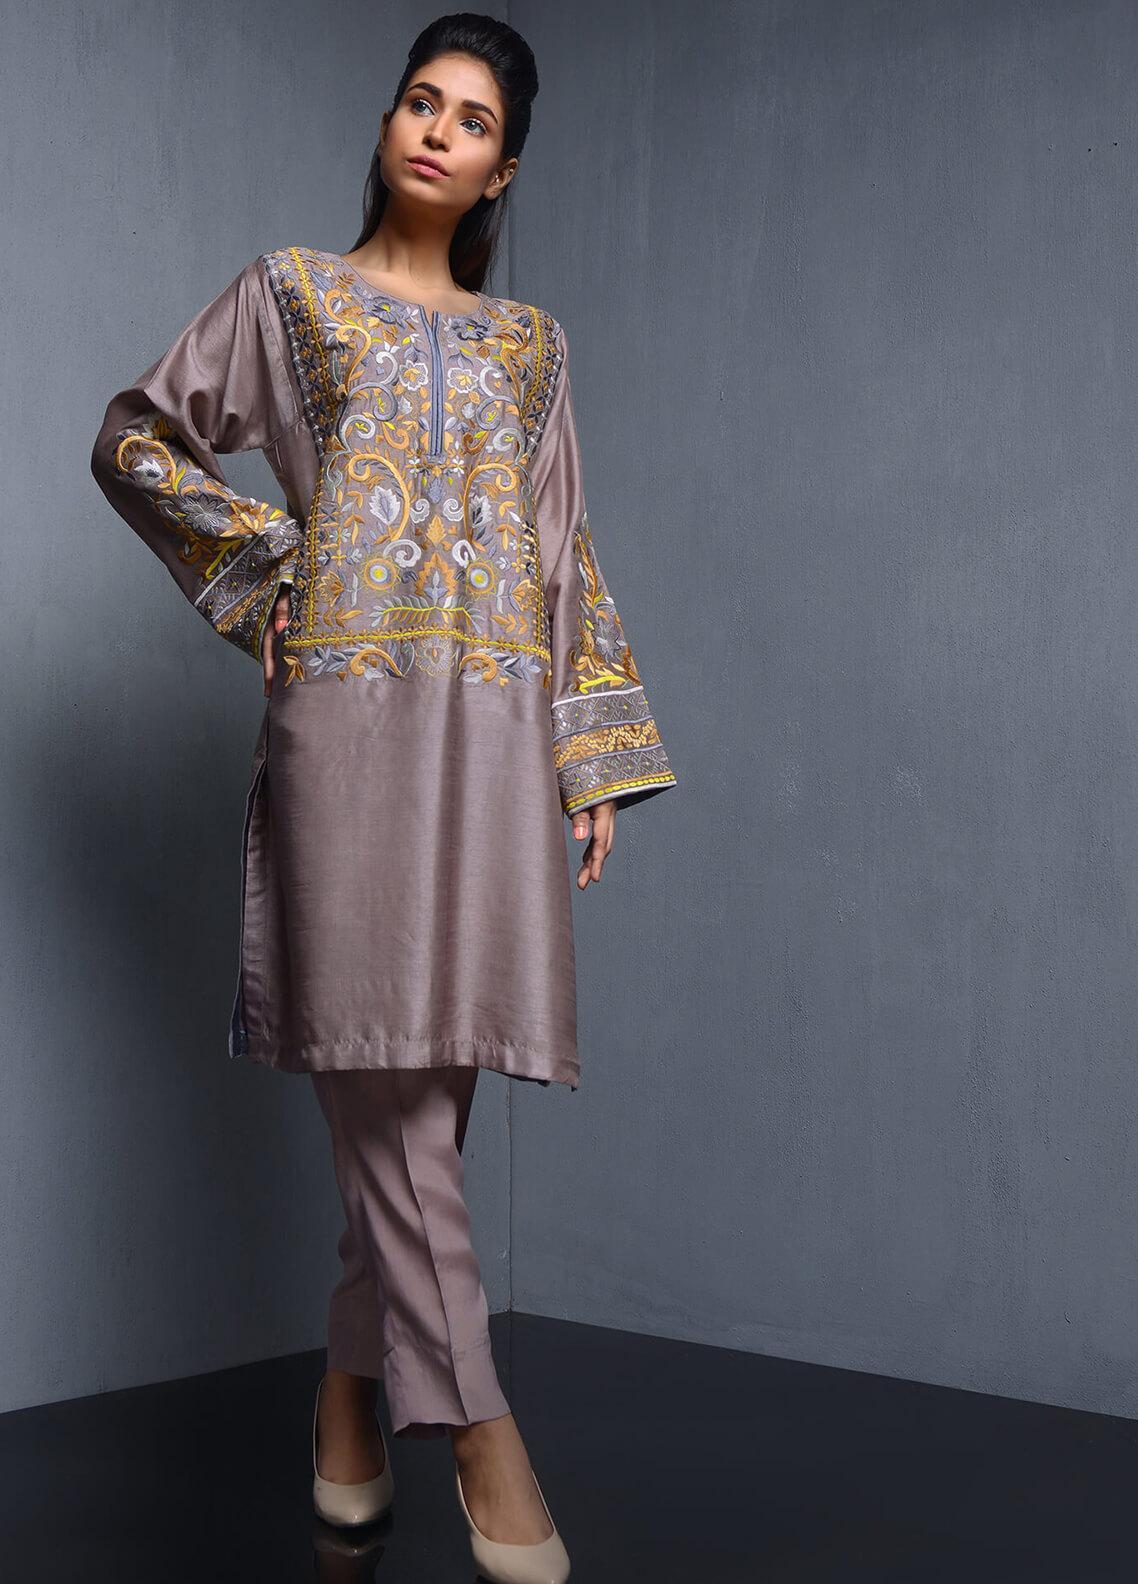 Kuli Jume Embroidered Raw Silk Stitched 2 Piece Suit Radiant Mauve